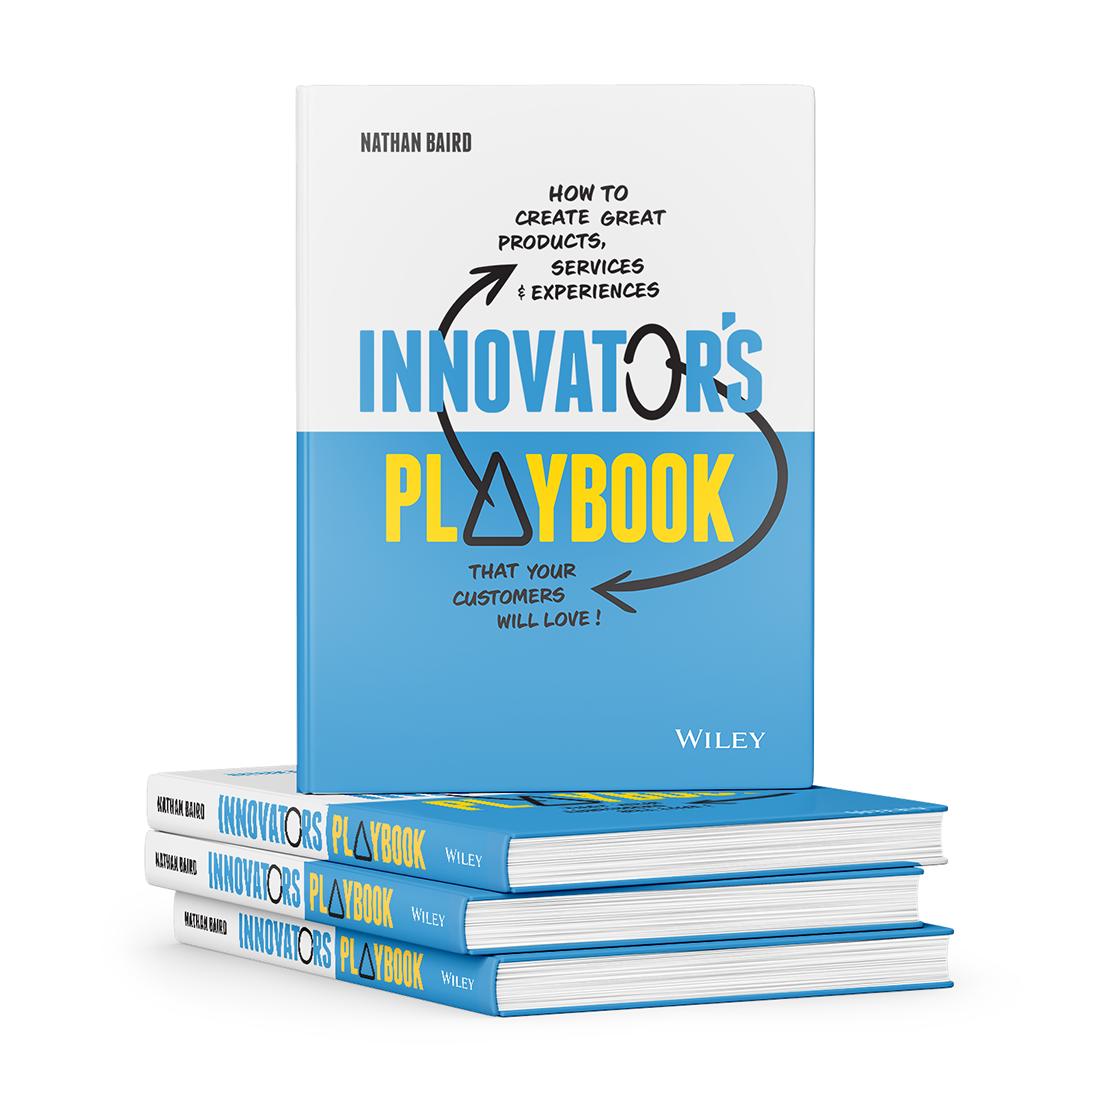 InnovatorsPlaybook